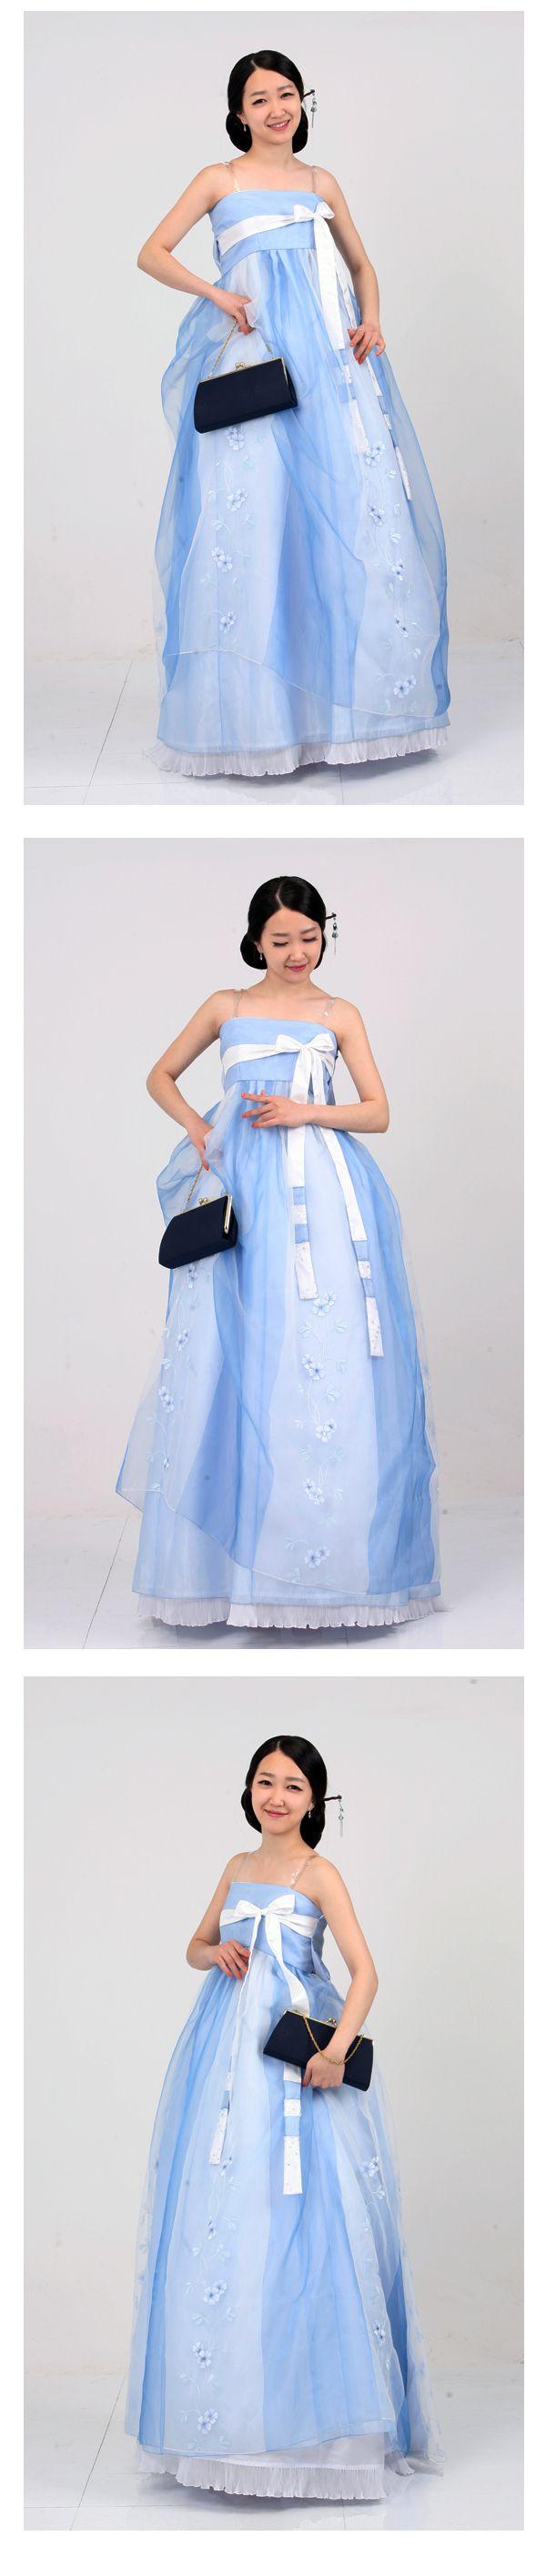 buy korean clothes online,wedding hanbok,traditional korean dress,modern hanbok,hanbok for men